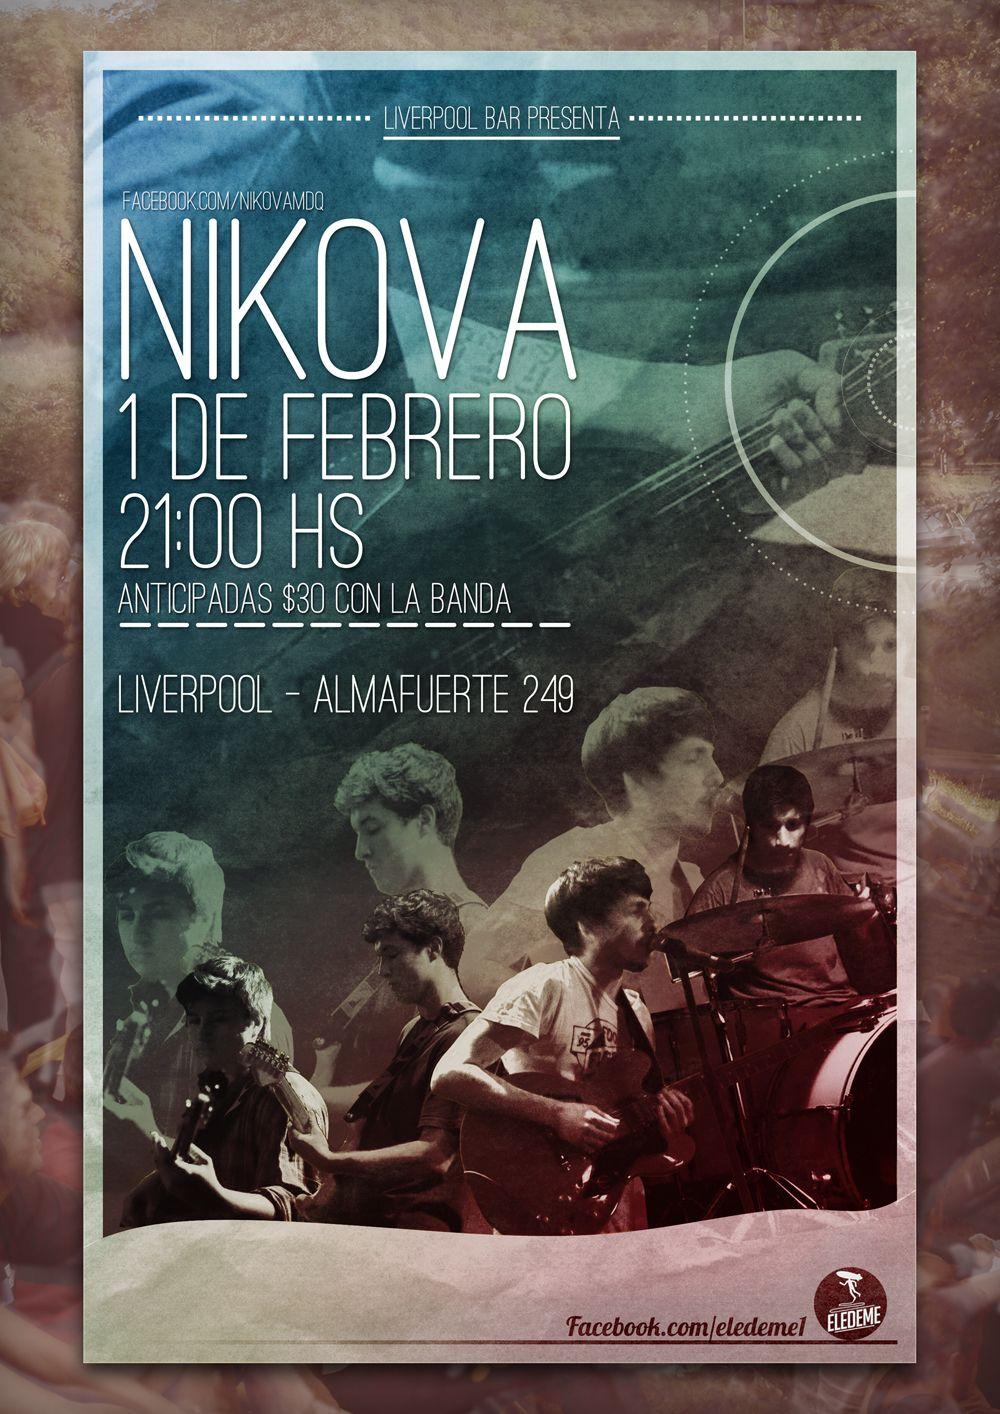 Flyer Para Nikova 1 De Febrero De 2014 1 De Febrero Almafuerte Febrero